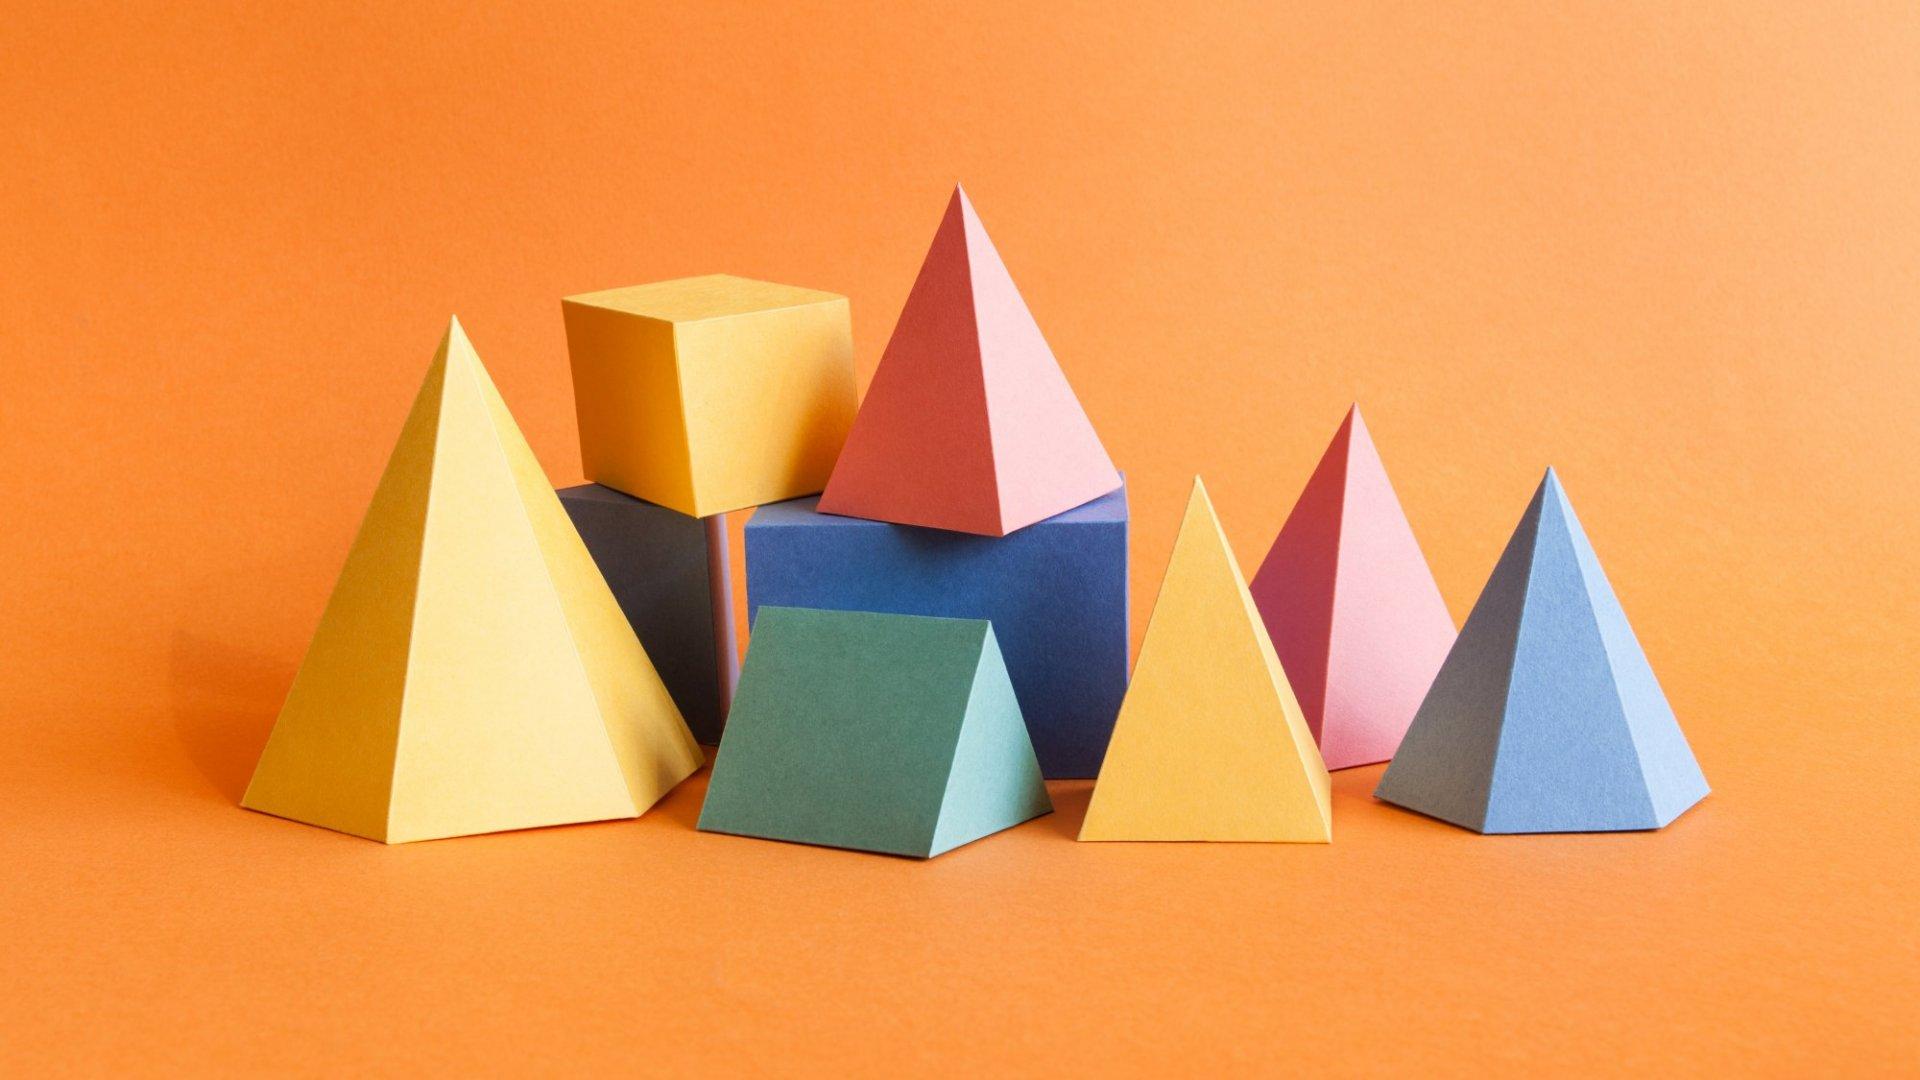 4 No-Risk, Non-Drug ADHD Treatments Ideal for Entrepreneurs